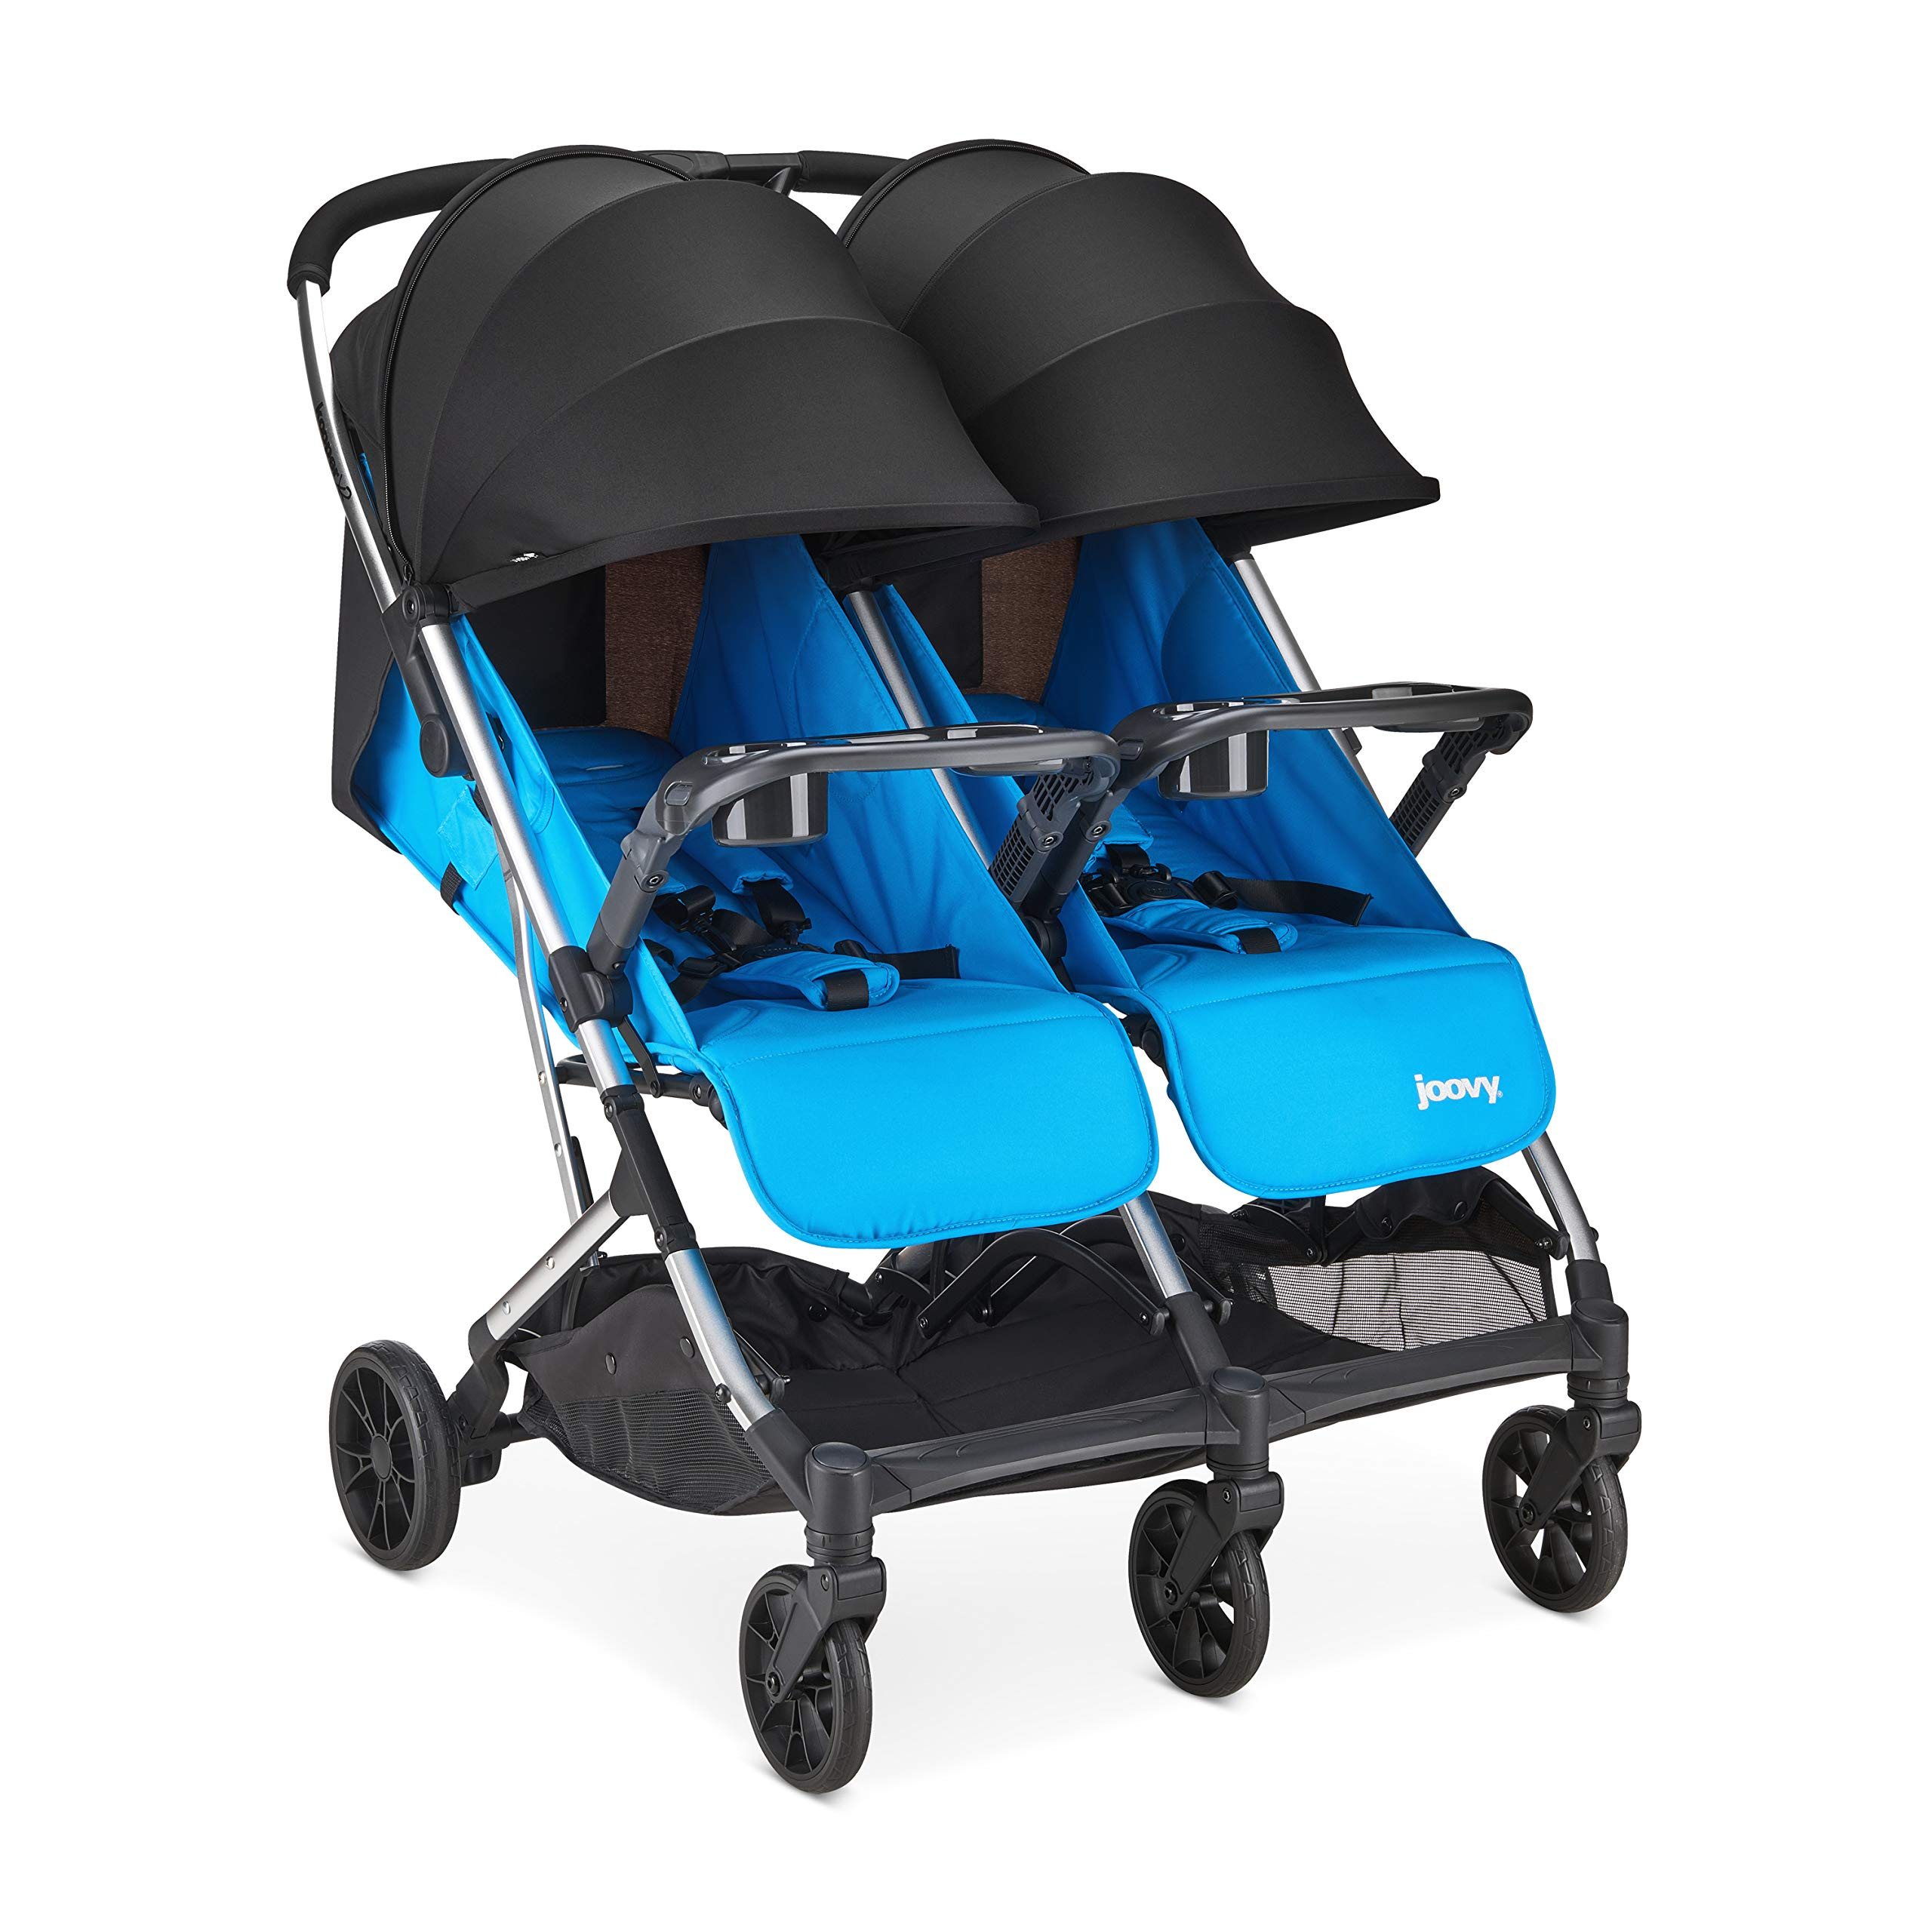 Joovy 8220 Kooper X2 Stroller, Glacier